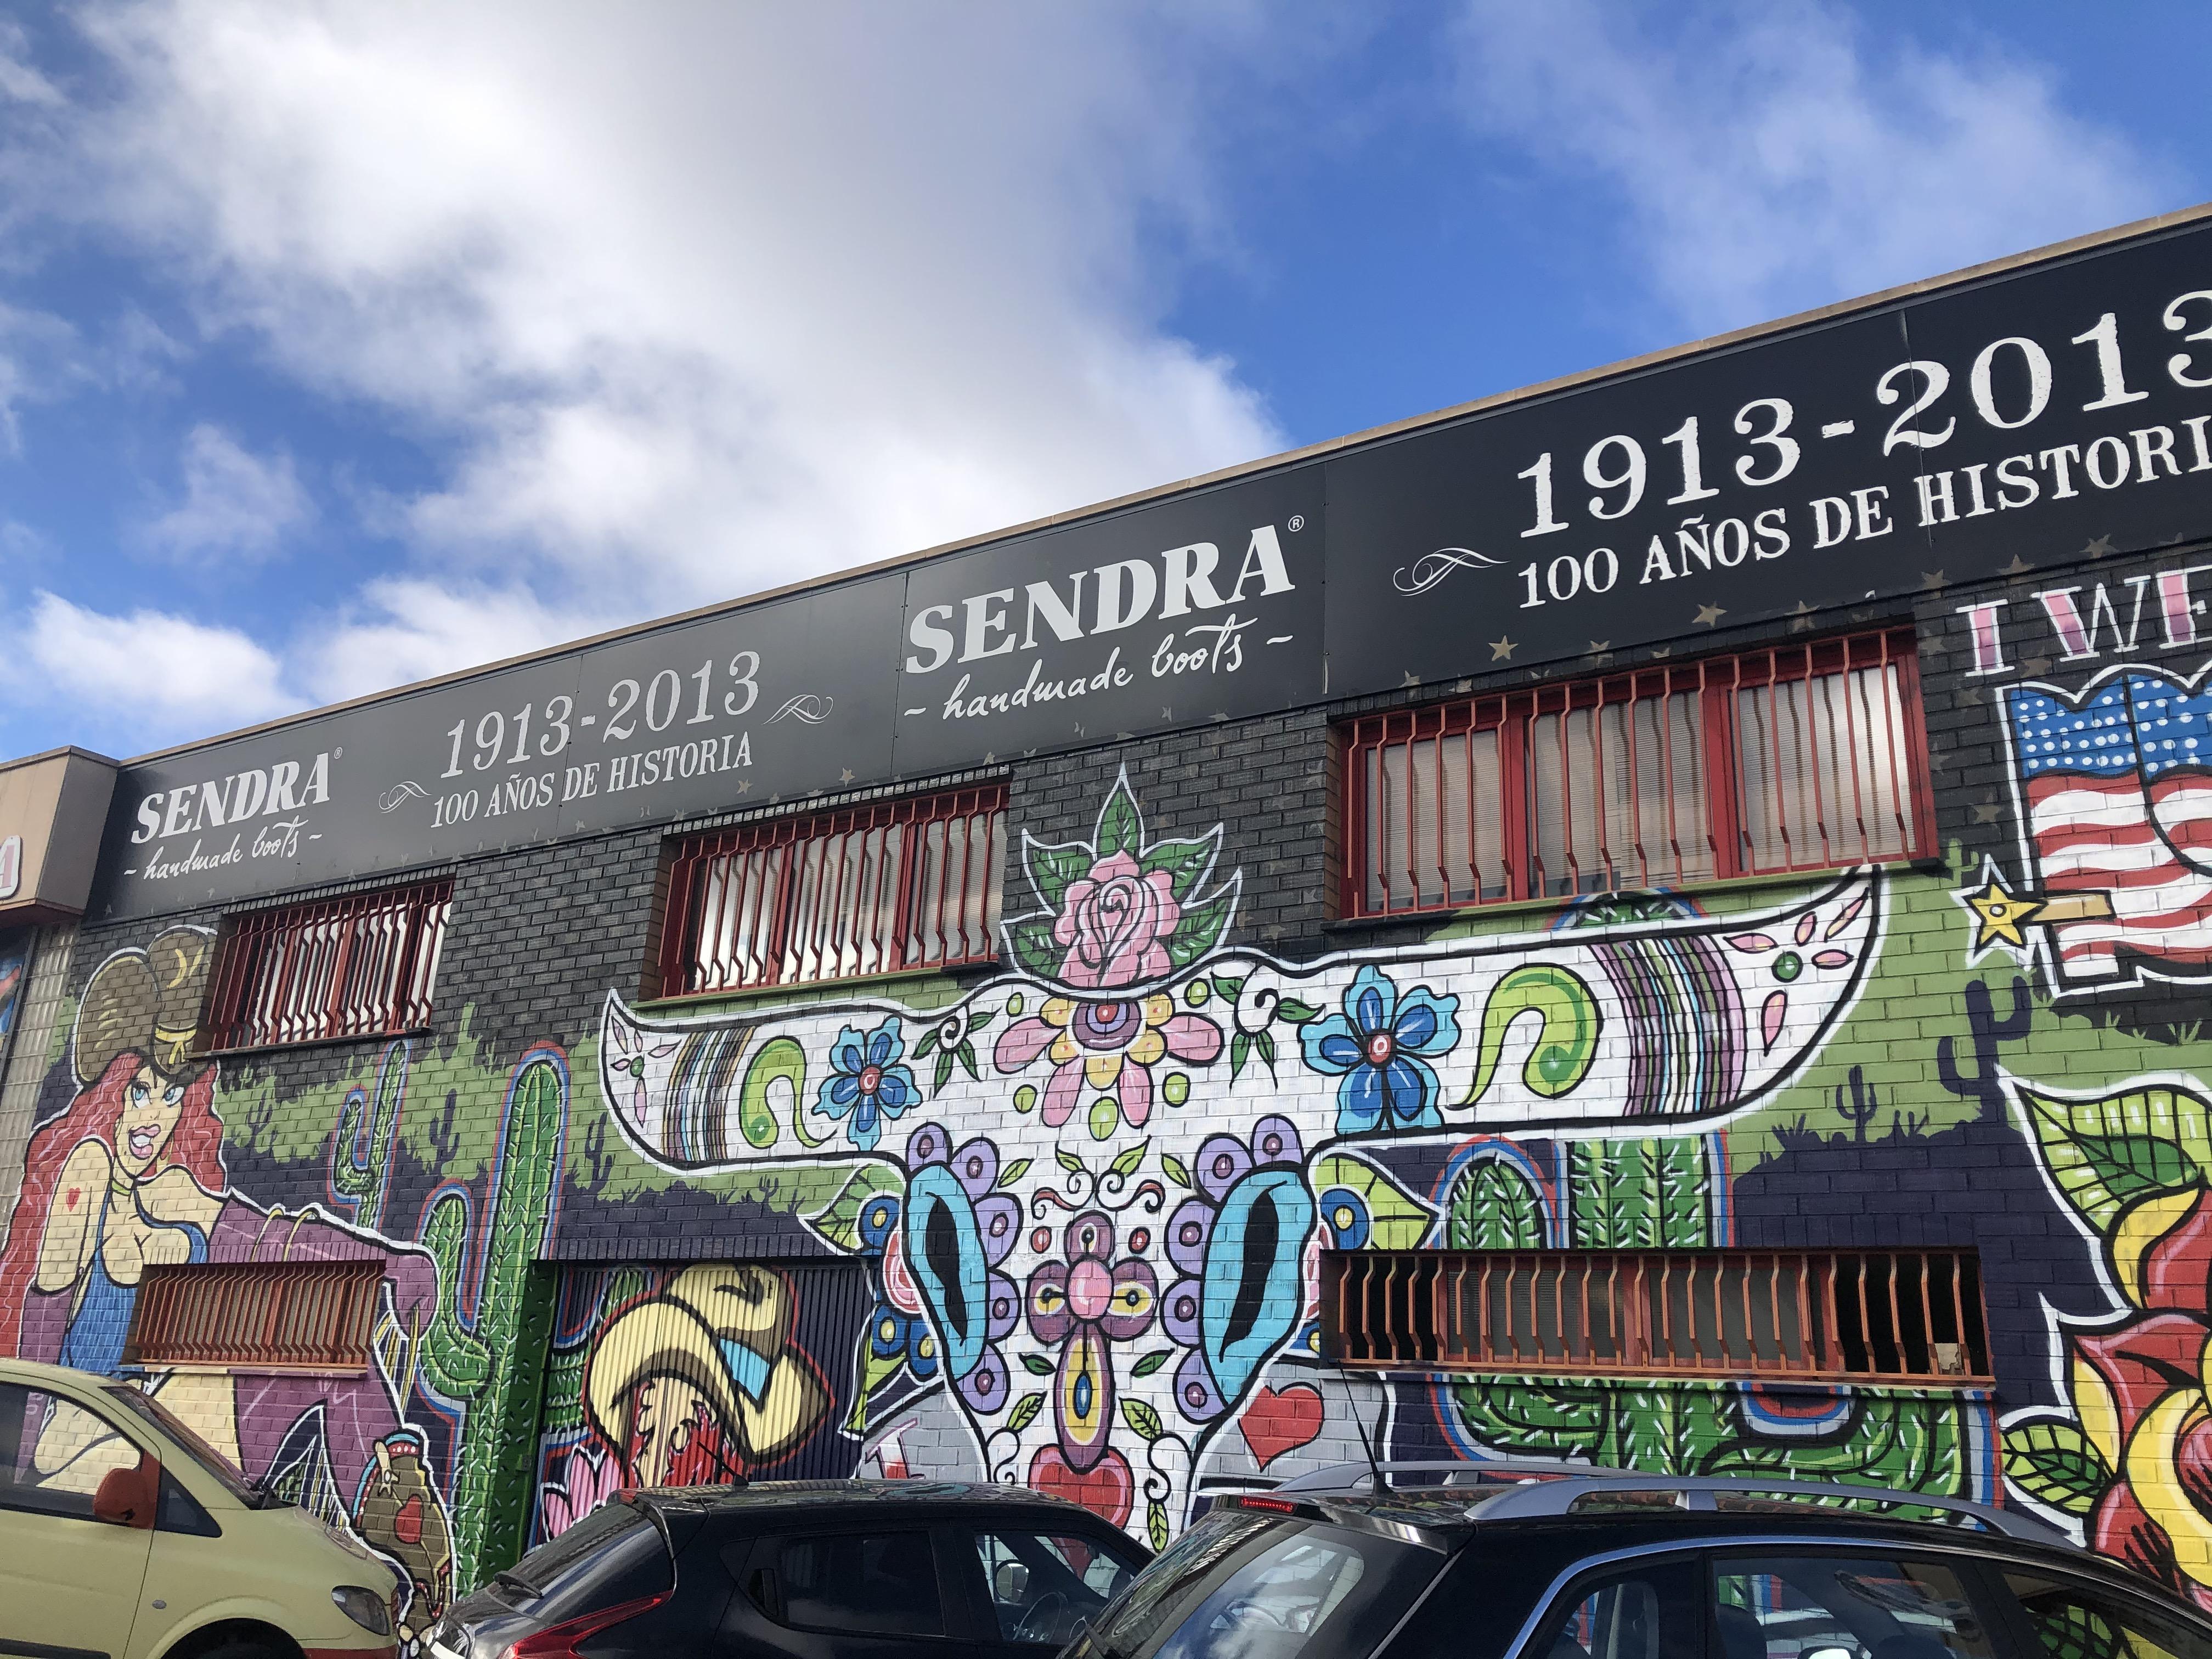 Sendra de fabriek Almansa